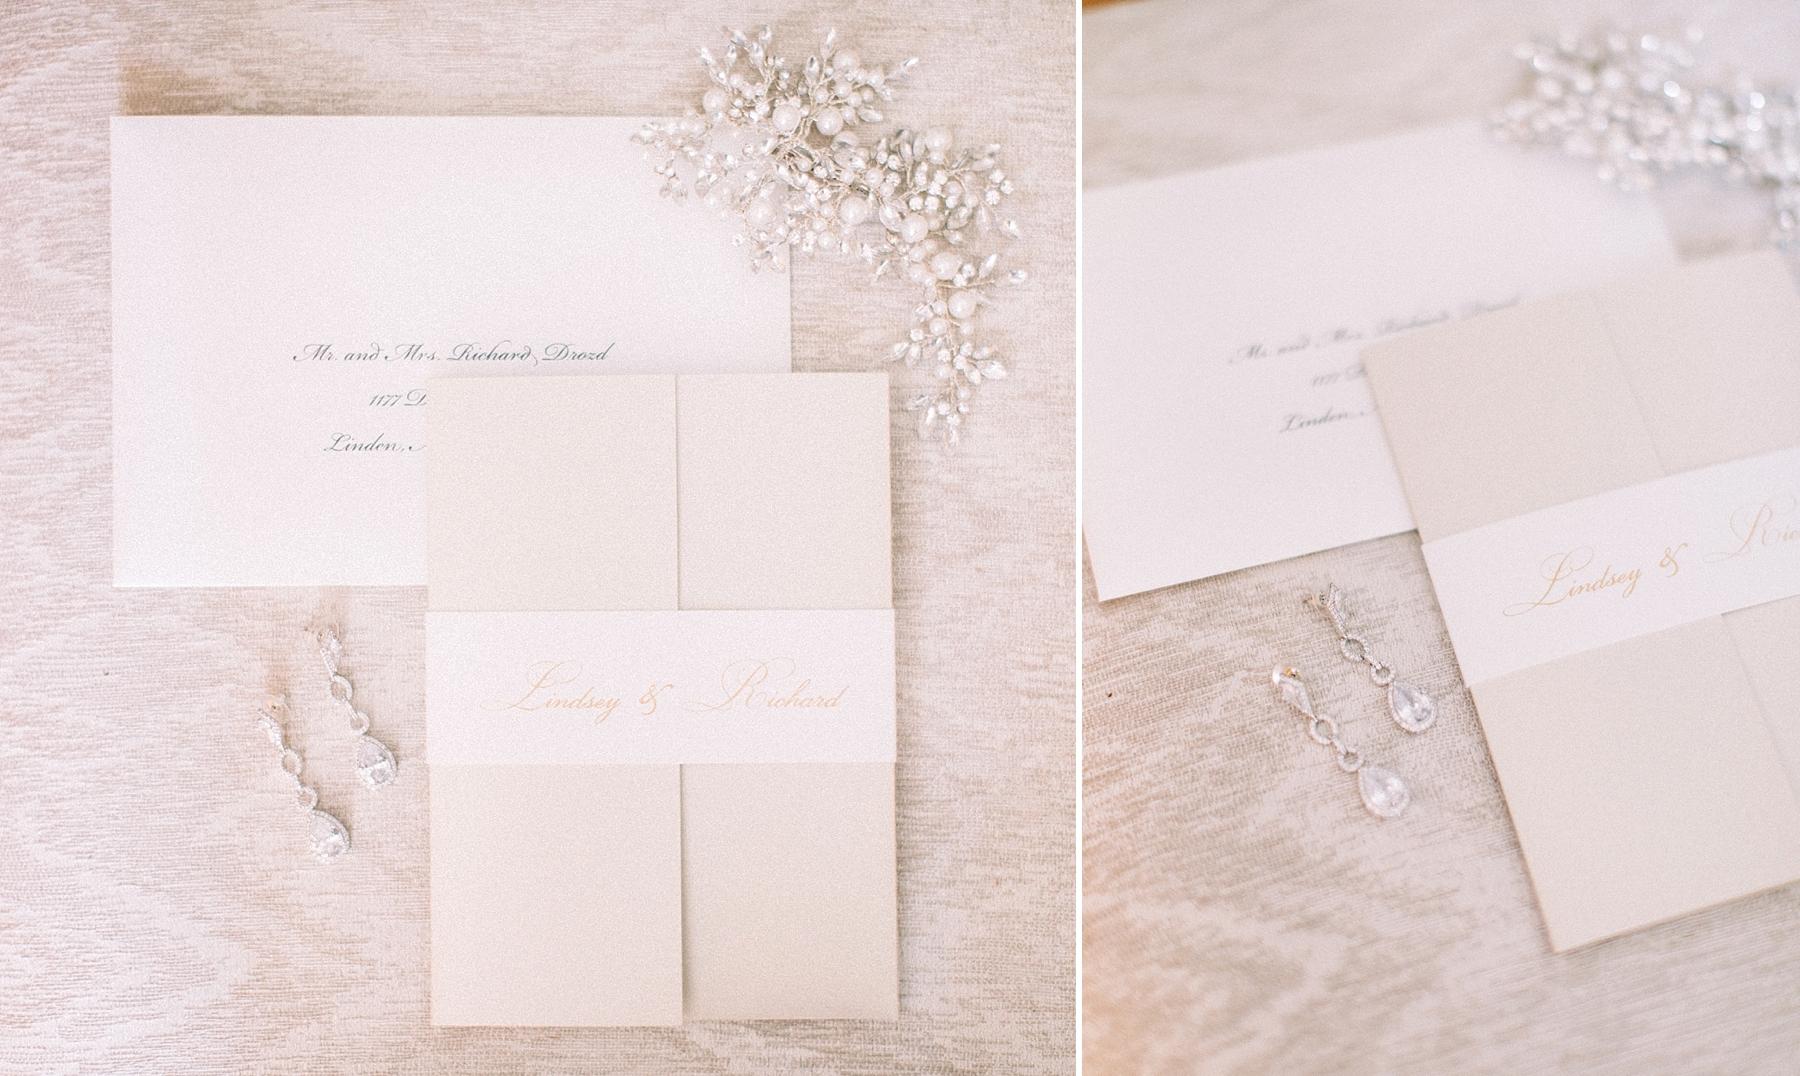 cranford-washington-nj-wedding-photographer-seasons_0002.jpg